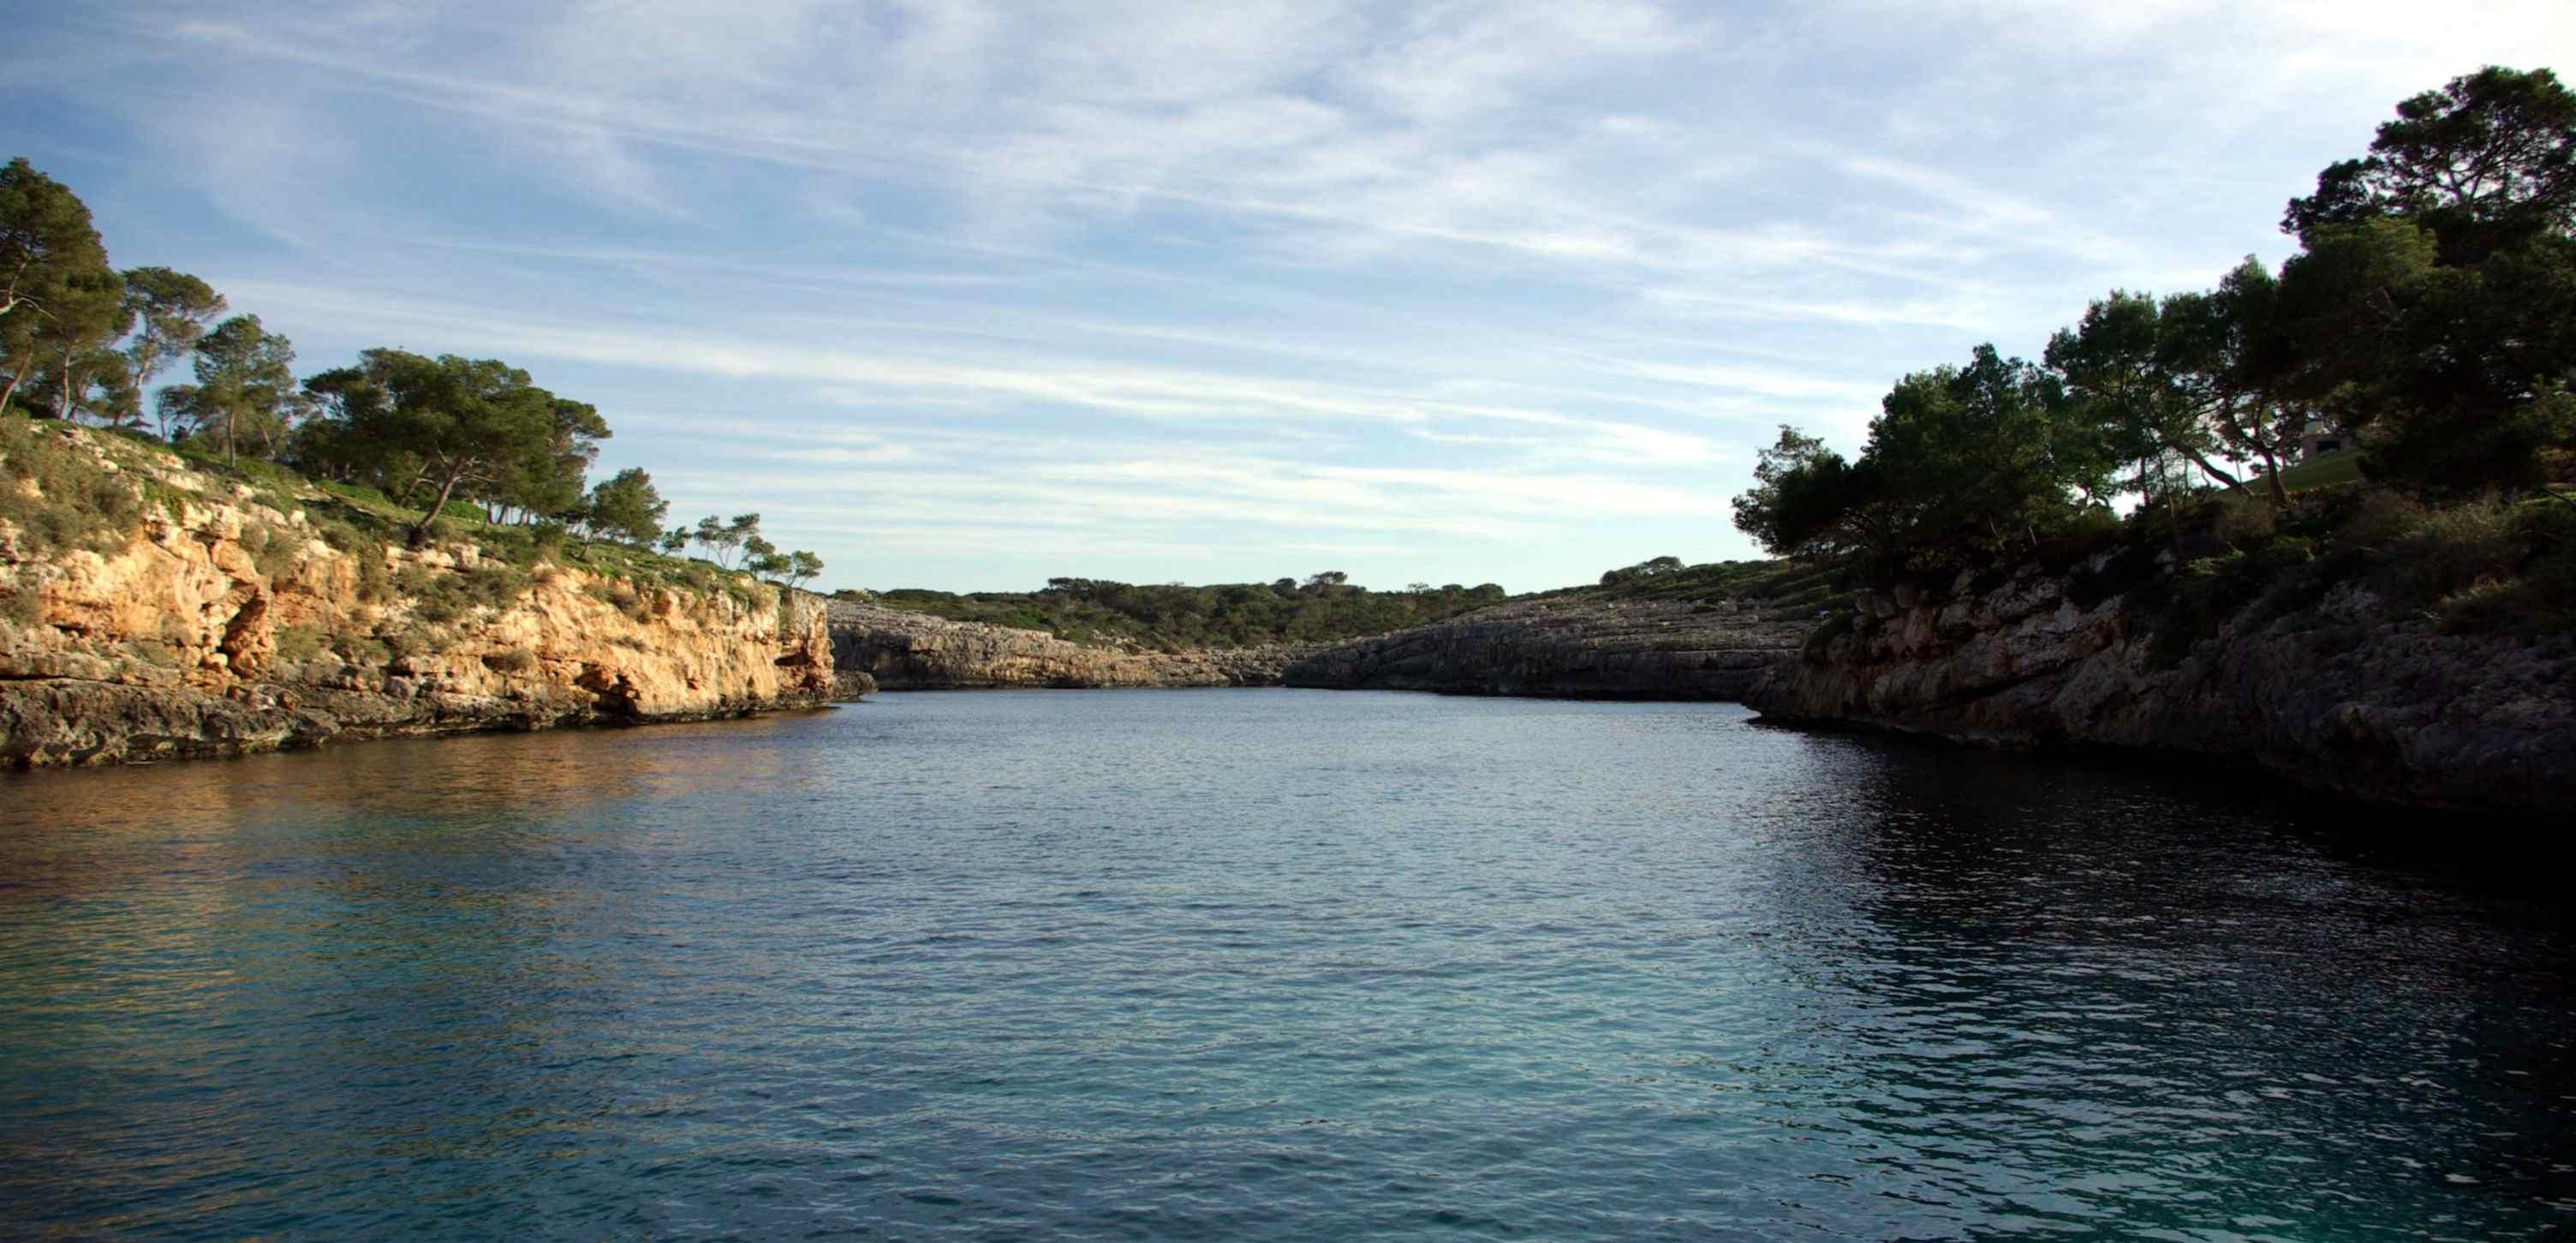 Foto playa Cala Mitjana. Cala Mitjana - Buy a print in - http://cafate.blogspot.com/